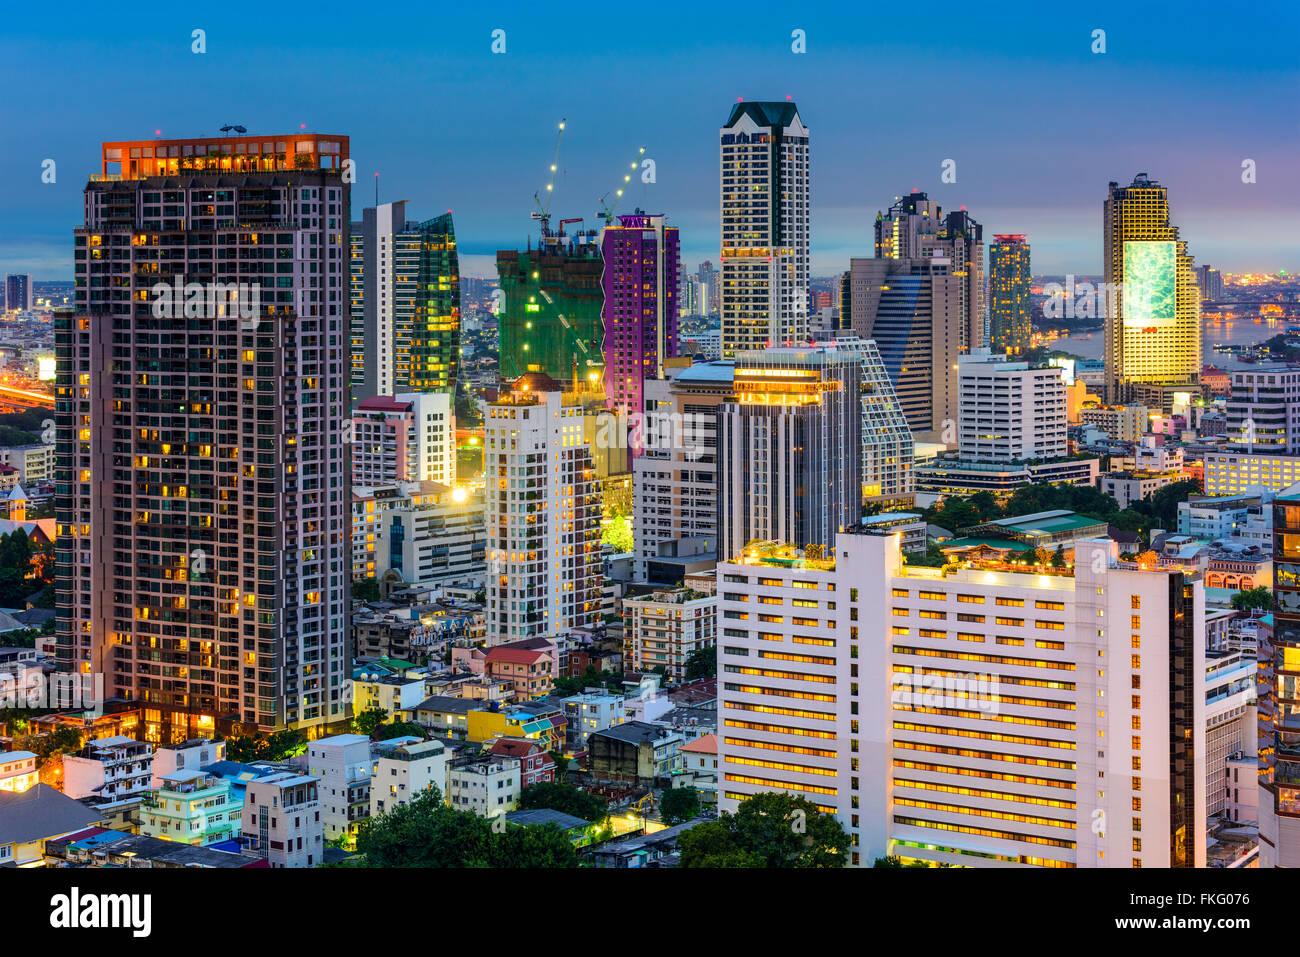 Bangkok, Thaïlande, du quartier financier paysage urbain. Photo Stock